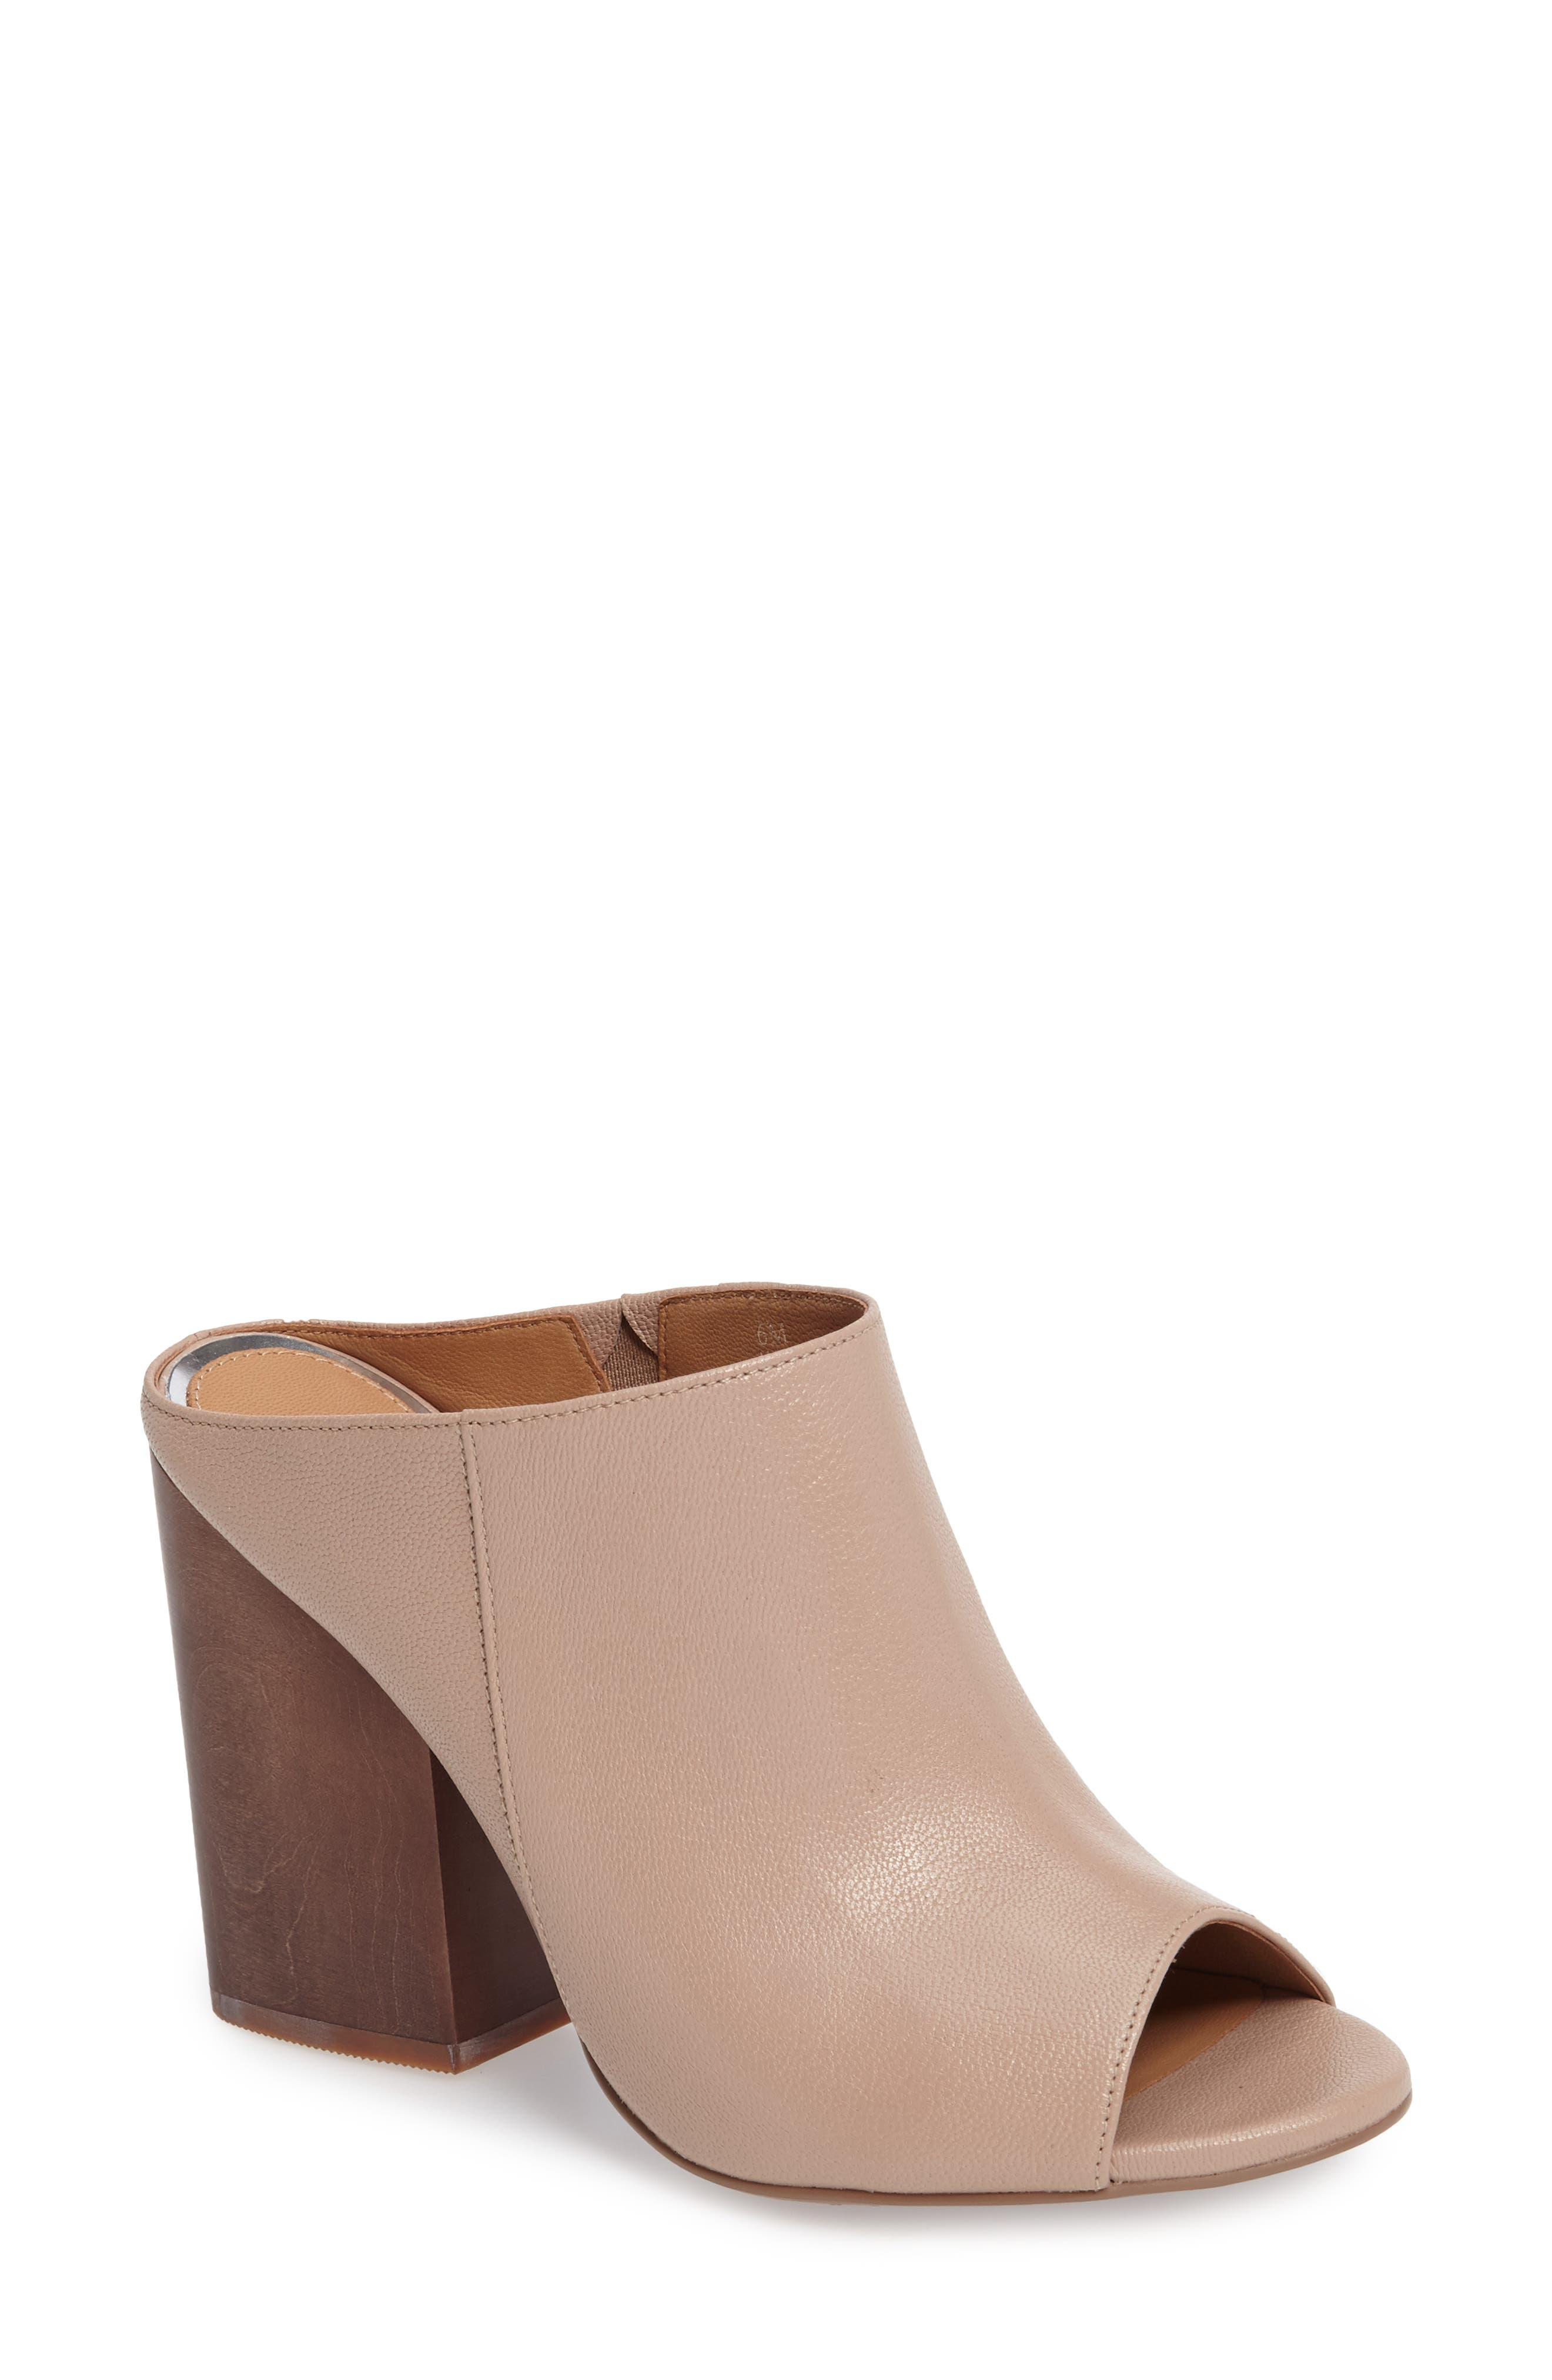 Gabby Block Heel Mule,                             Main thumbnail 1, color,                             Blush Leather